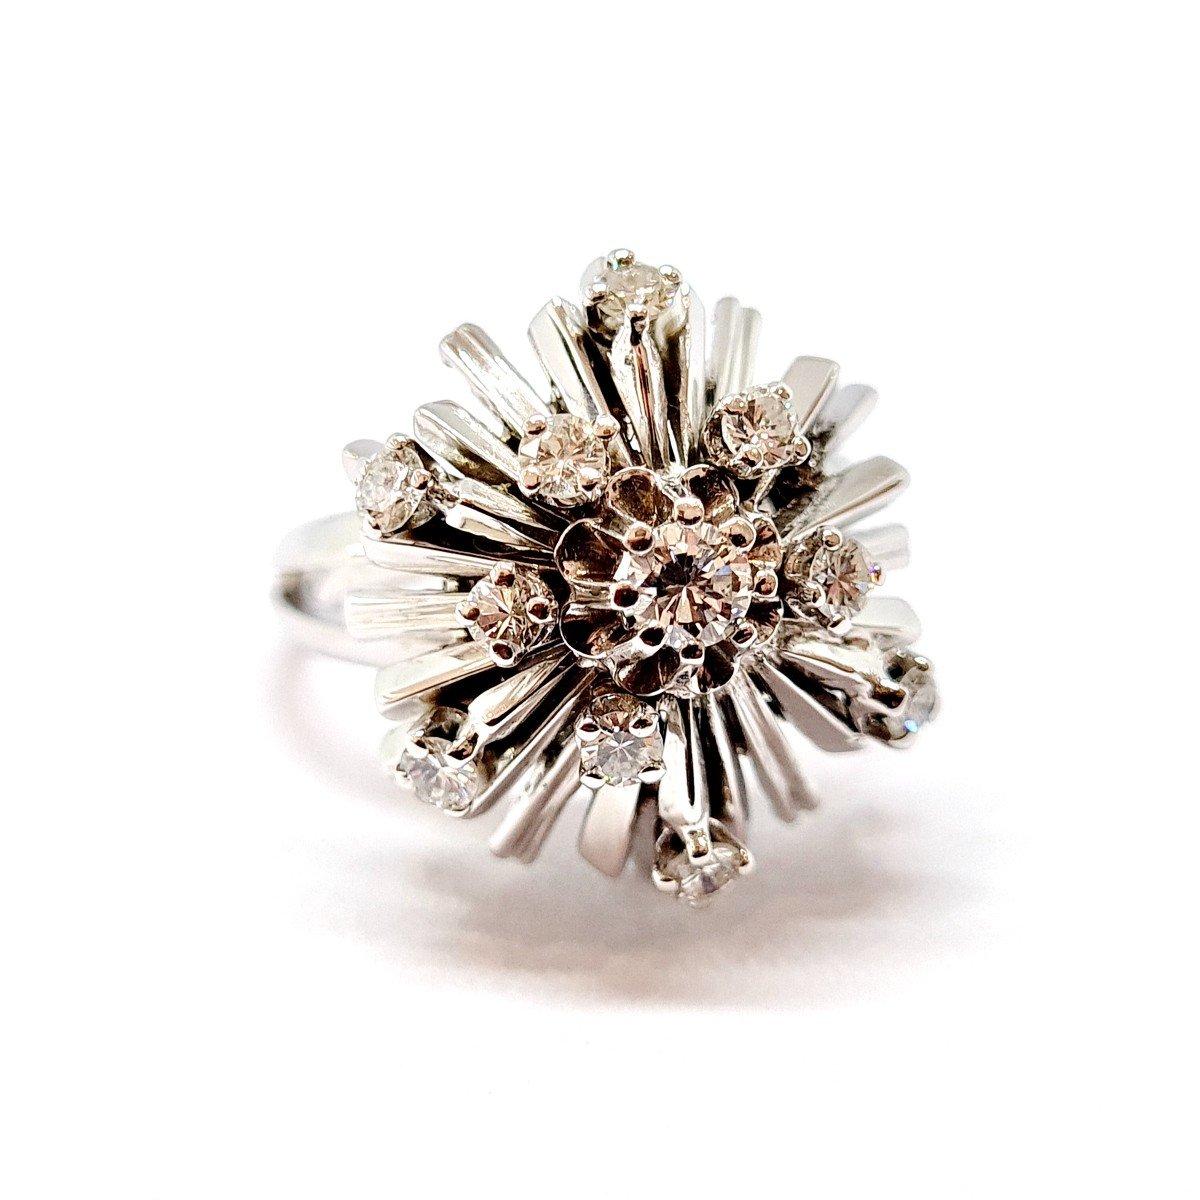 Bague Ancienne Or Blanc 18 Carats Diamants-photo-4